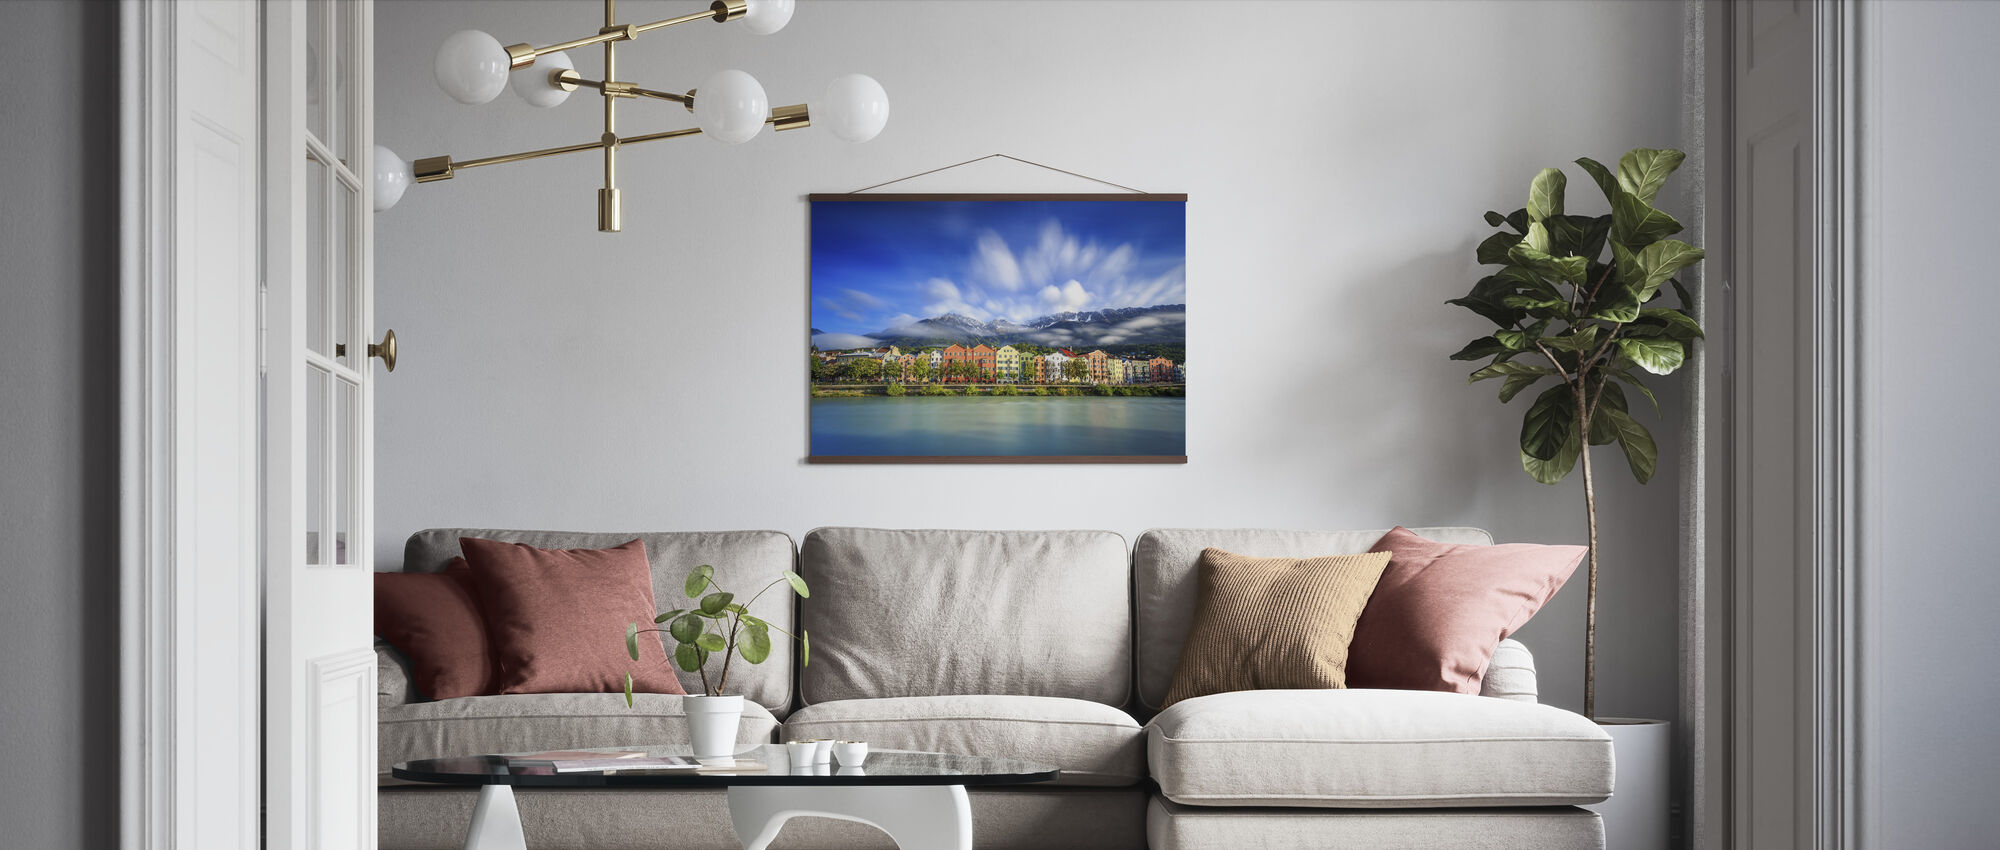 Clouds over Innsbruck - Poster - Living Room